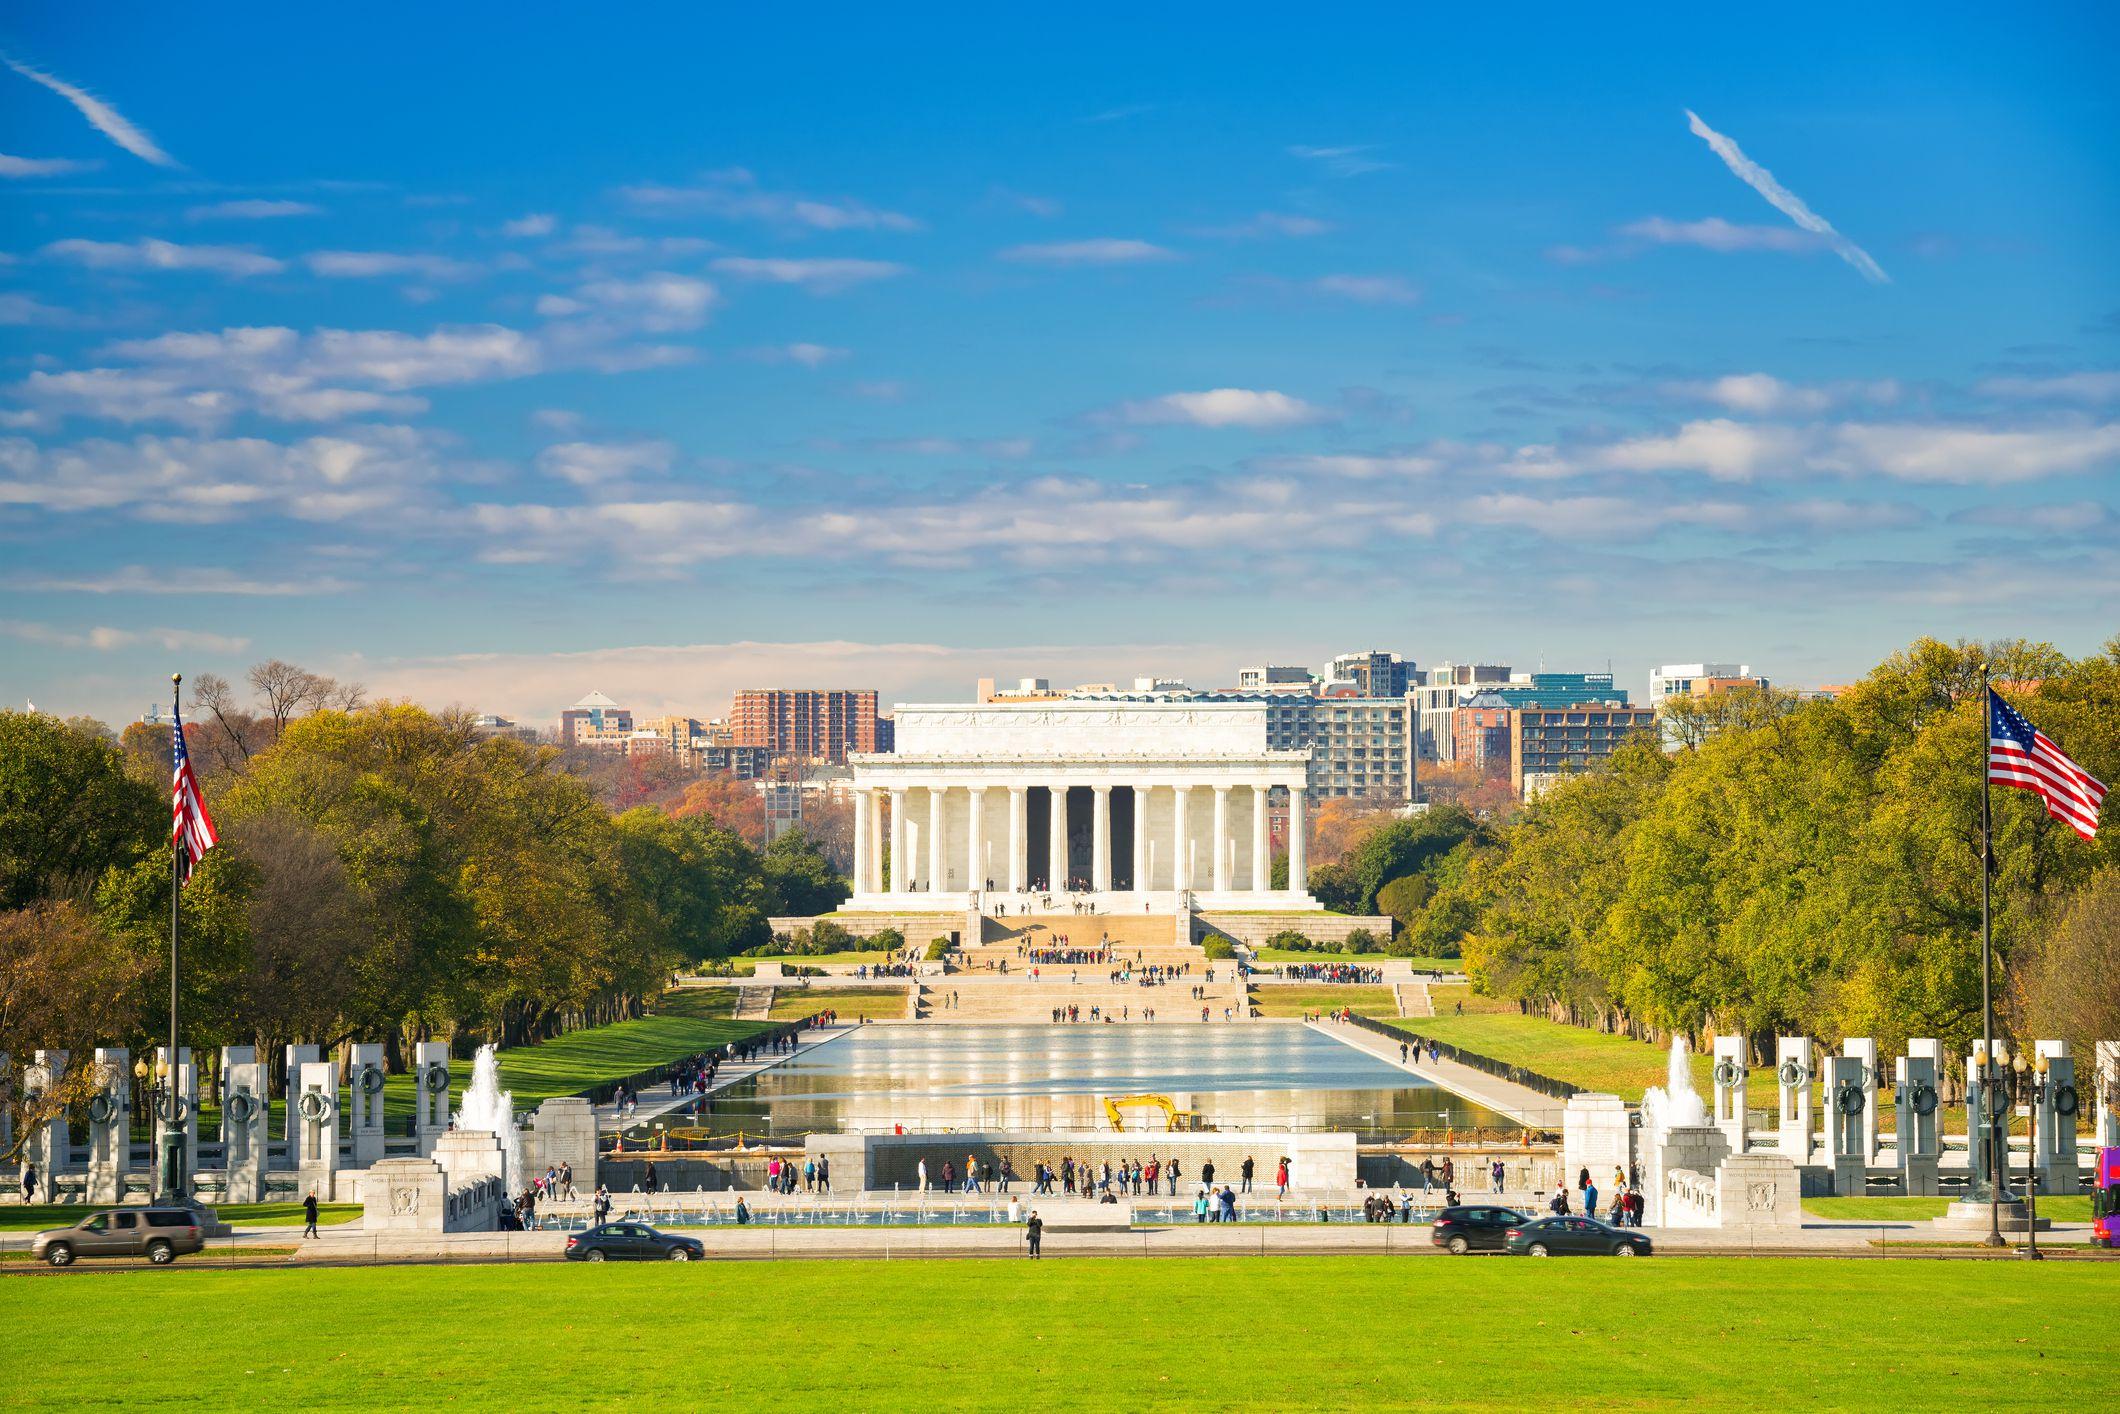 Apa yang Dapat Dilihat dan Dilakukan di National Mall di Washington, D.C.